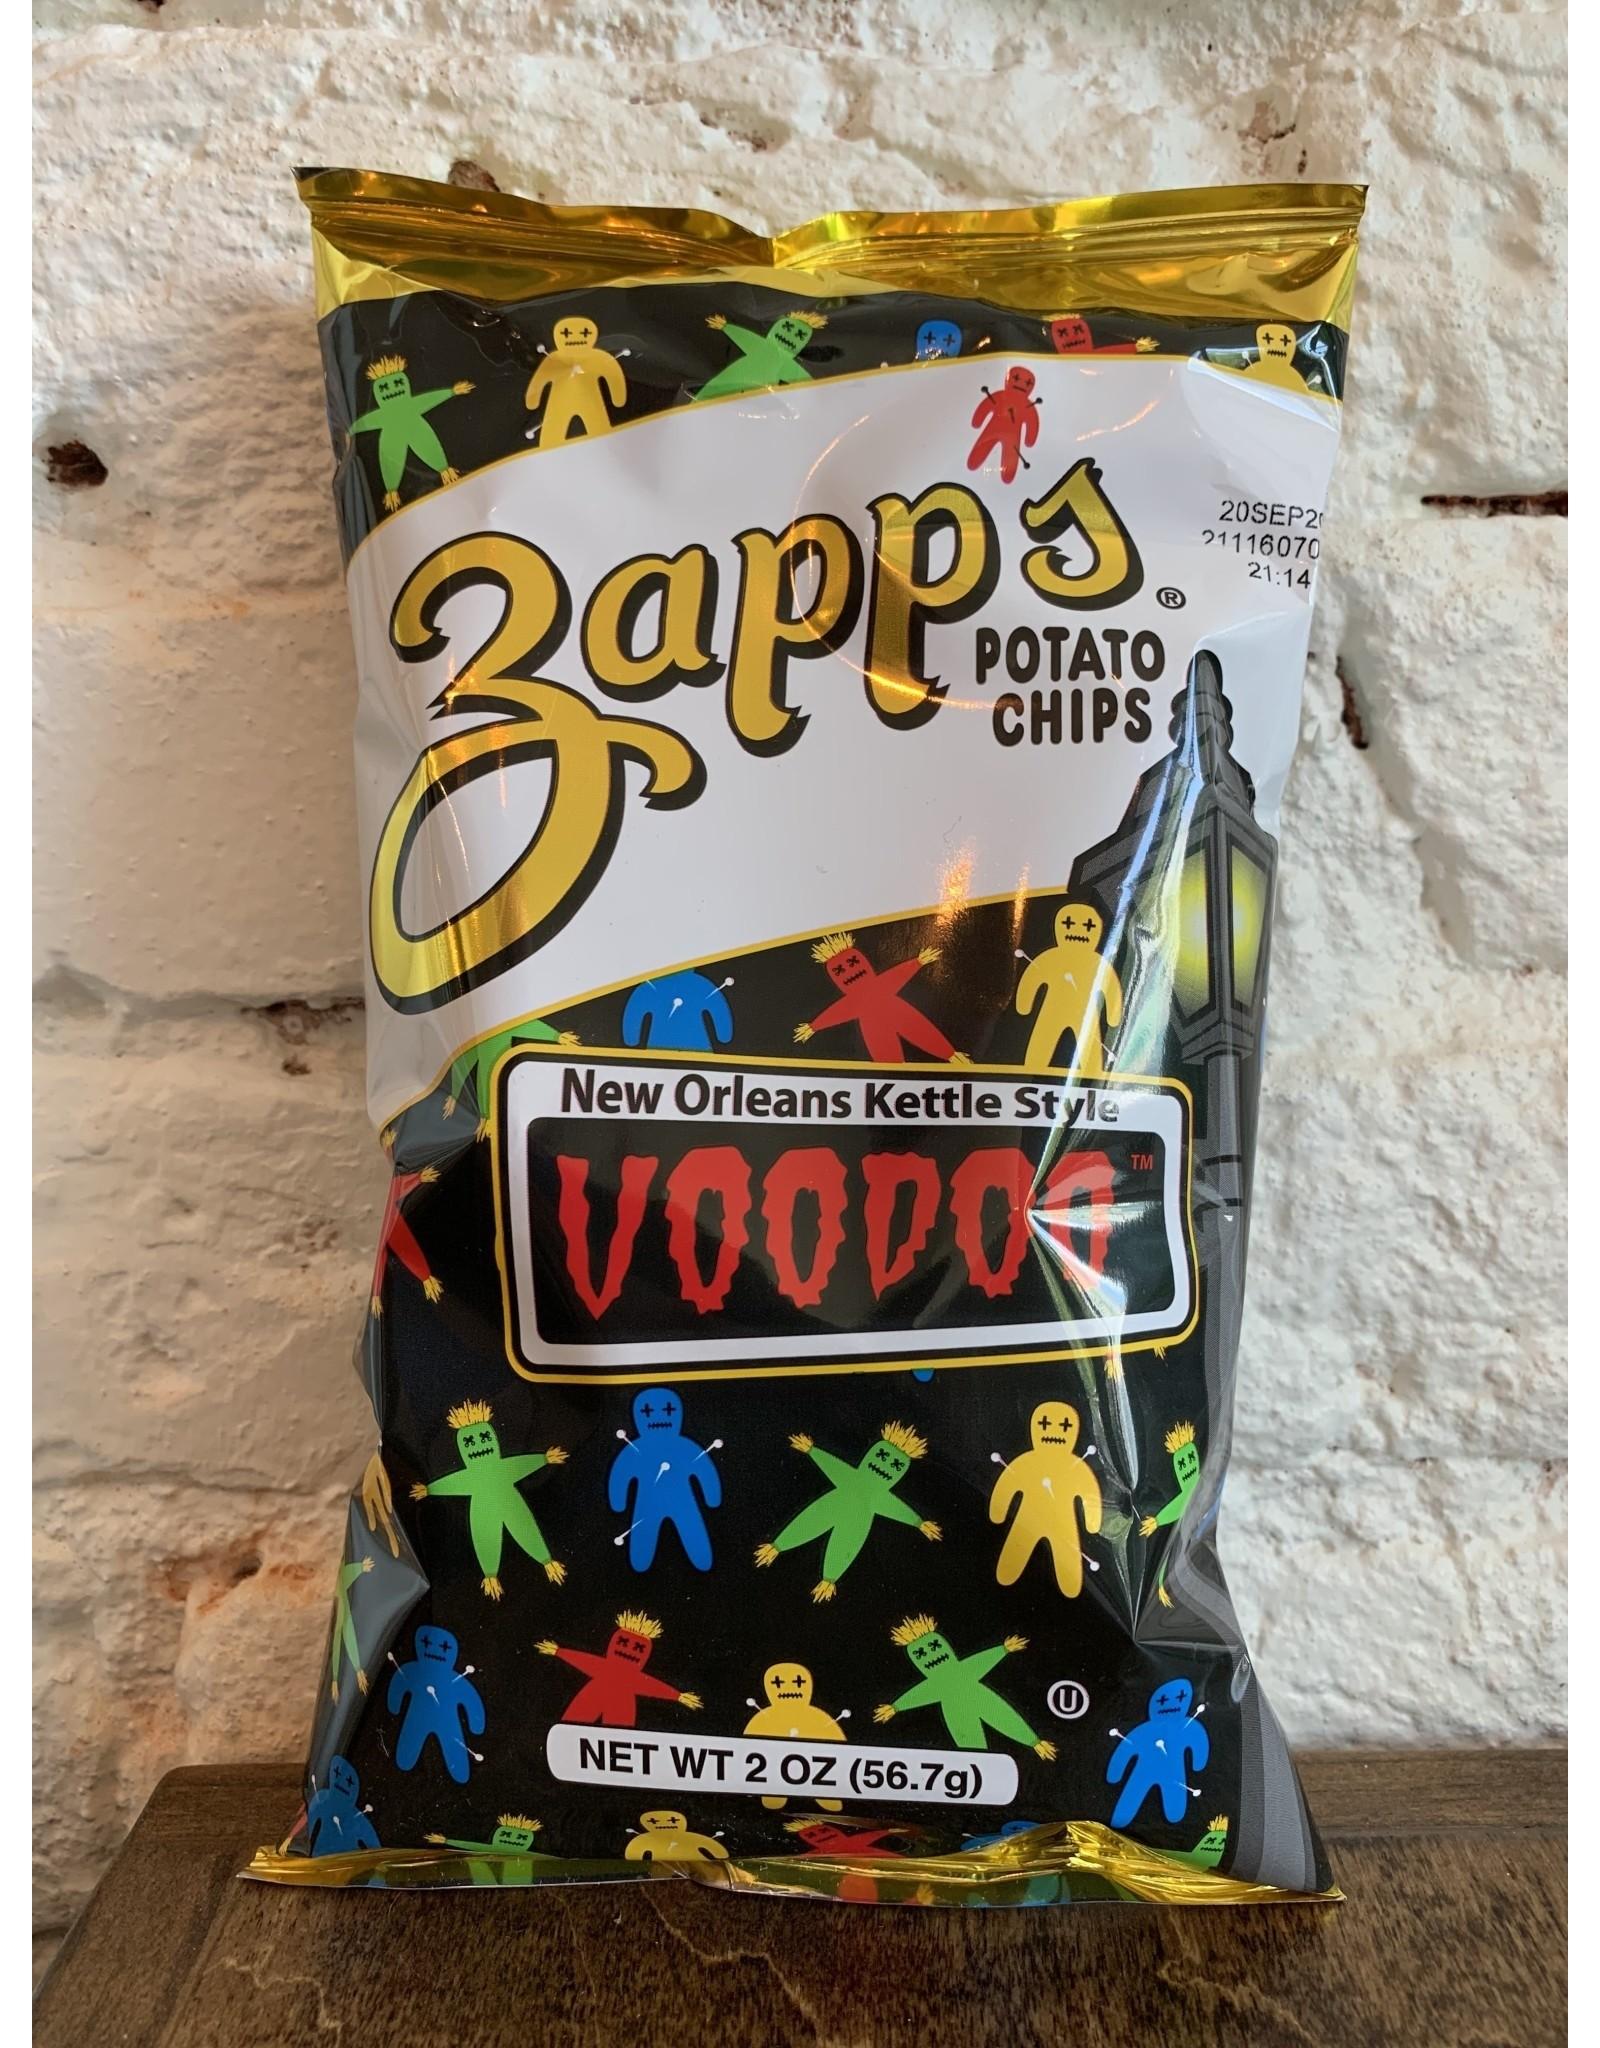 Zapps Zapps Potato Chips, Voodoo 2oz. Bag